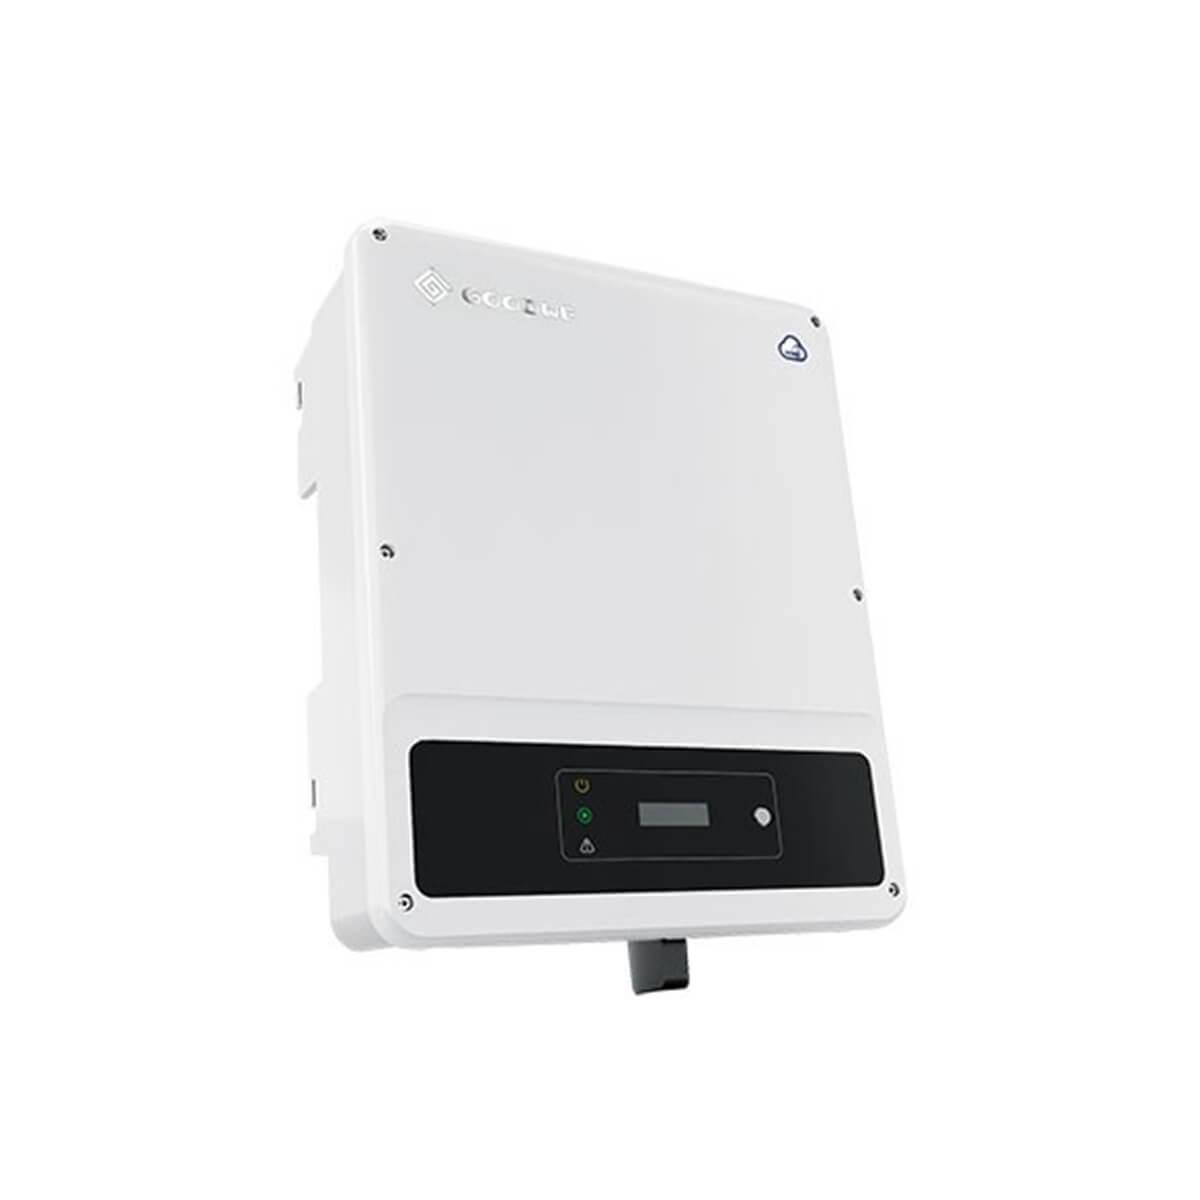 goodwe 3kW inverter, goodwe gw3000d-ns 3kW inverter, goodwe gw3000d-ns inverter, goodwe gw3000d-ns, goodwe 3 kW